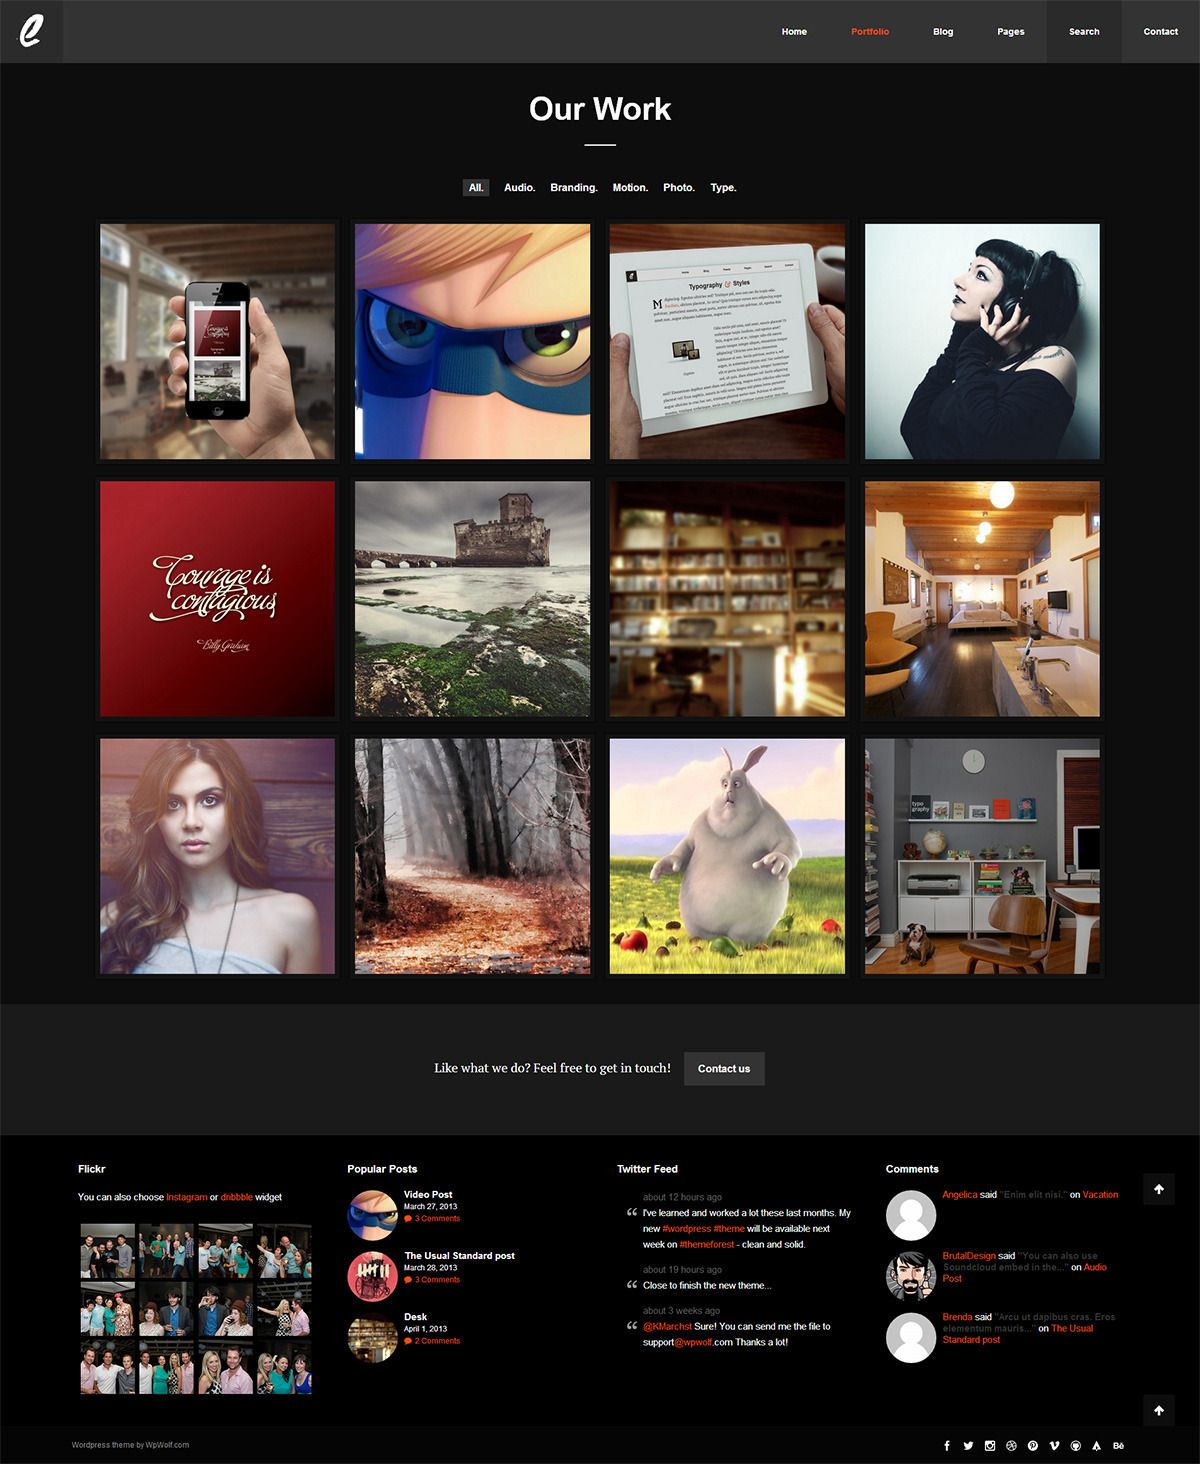 Ergo - Simple, Ergonomic and Clean Wordpress Theme #wordpress #theme #website #template #responsive #design #webdesign #flat #flatdesign #clean